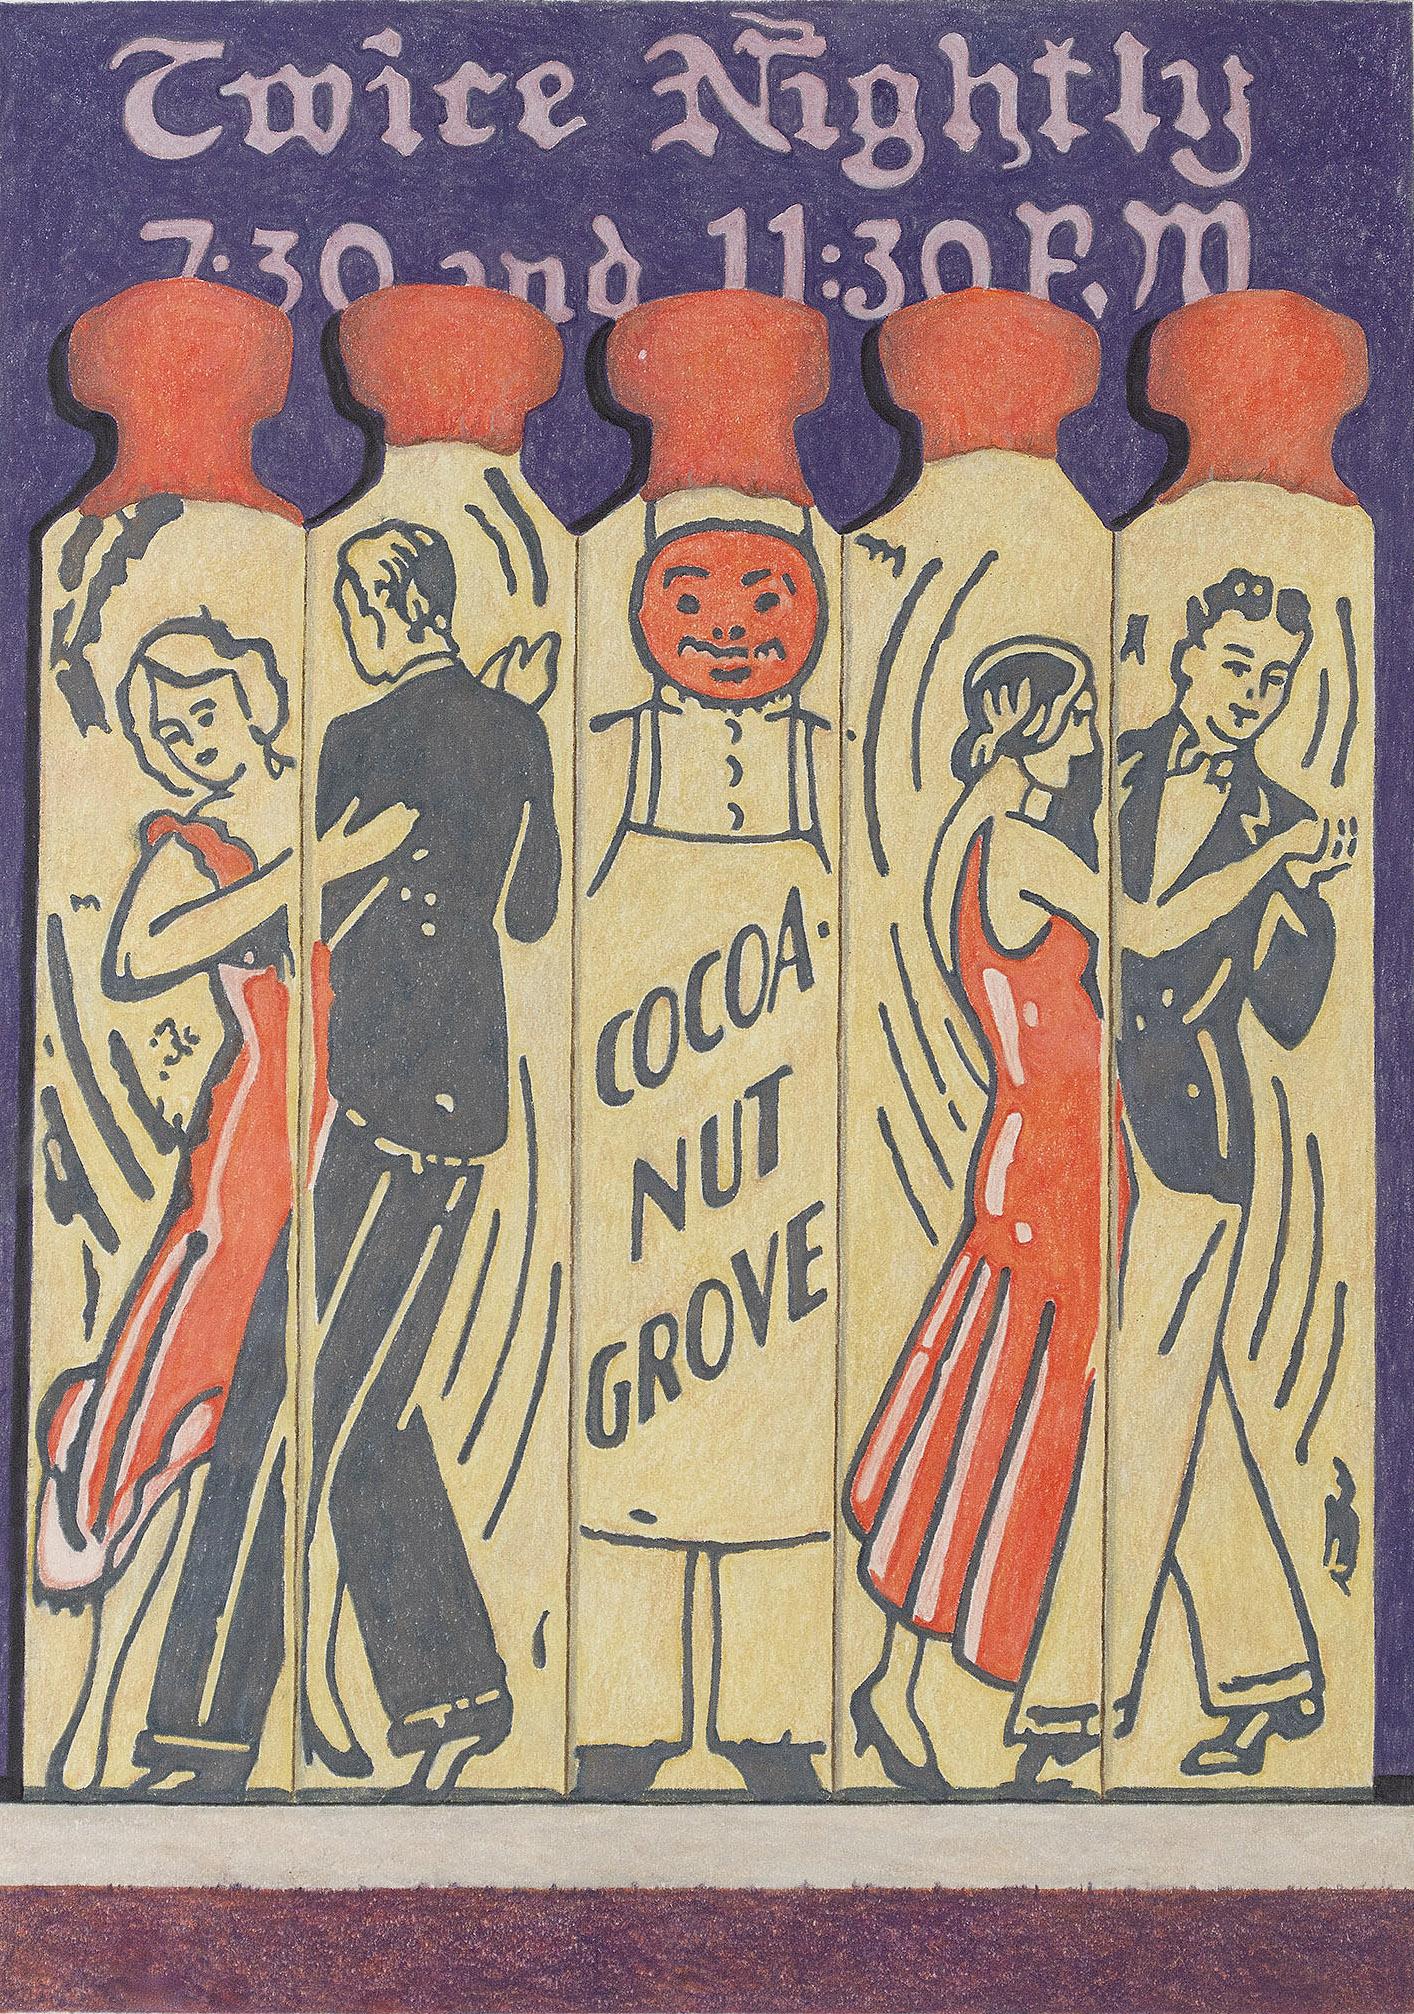 Cocoa Nut Grove